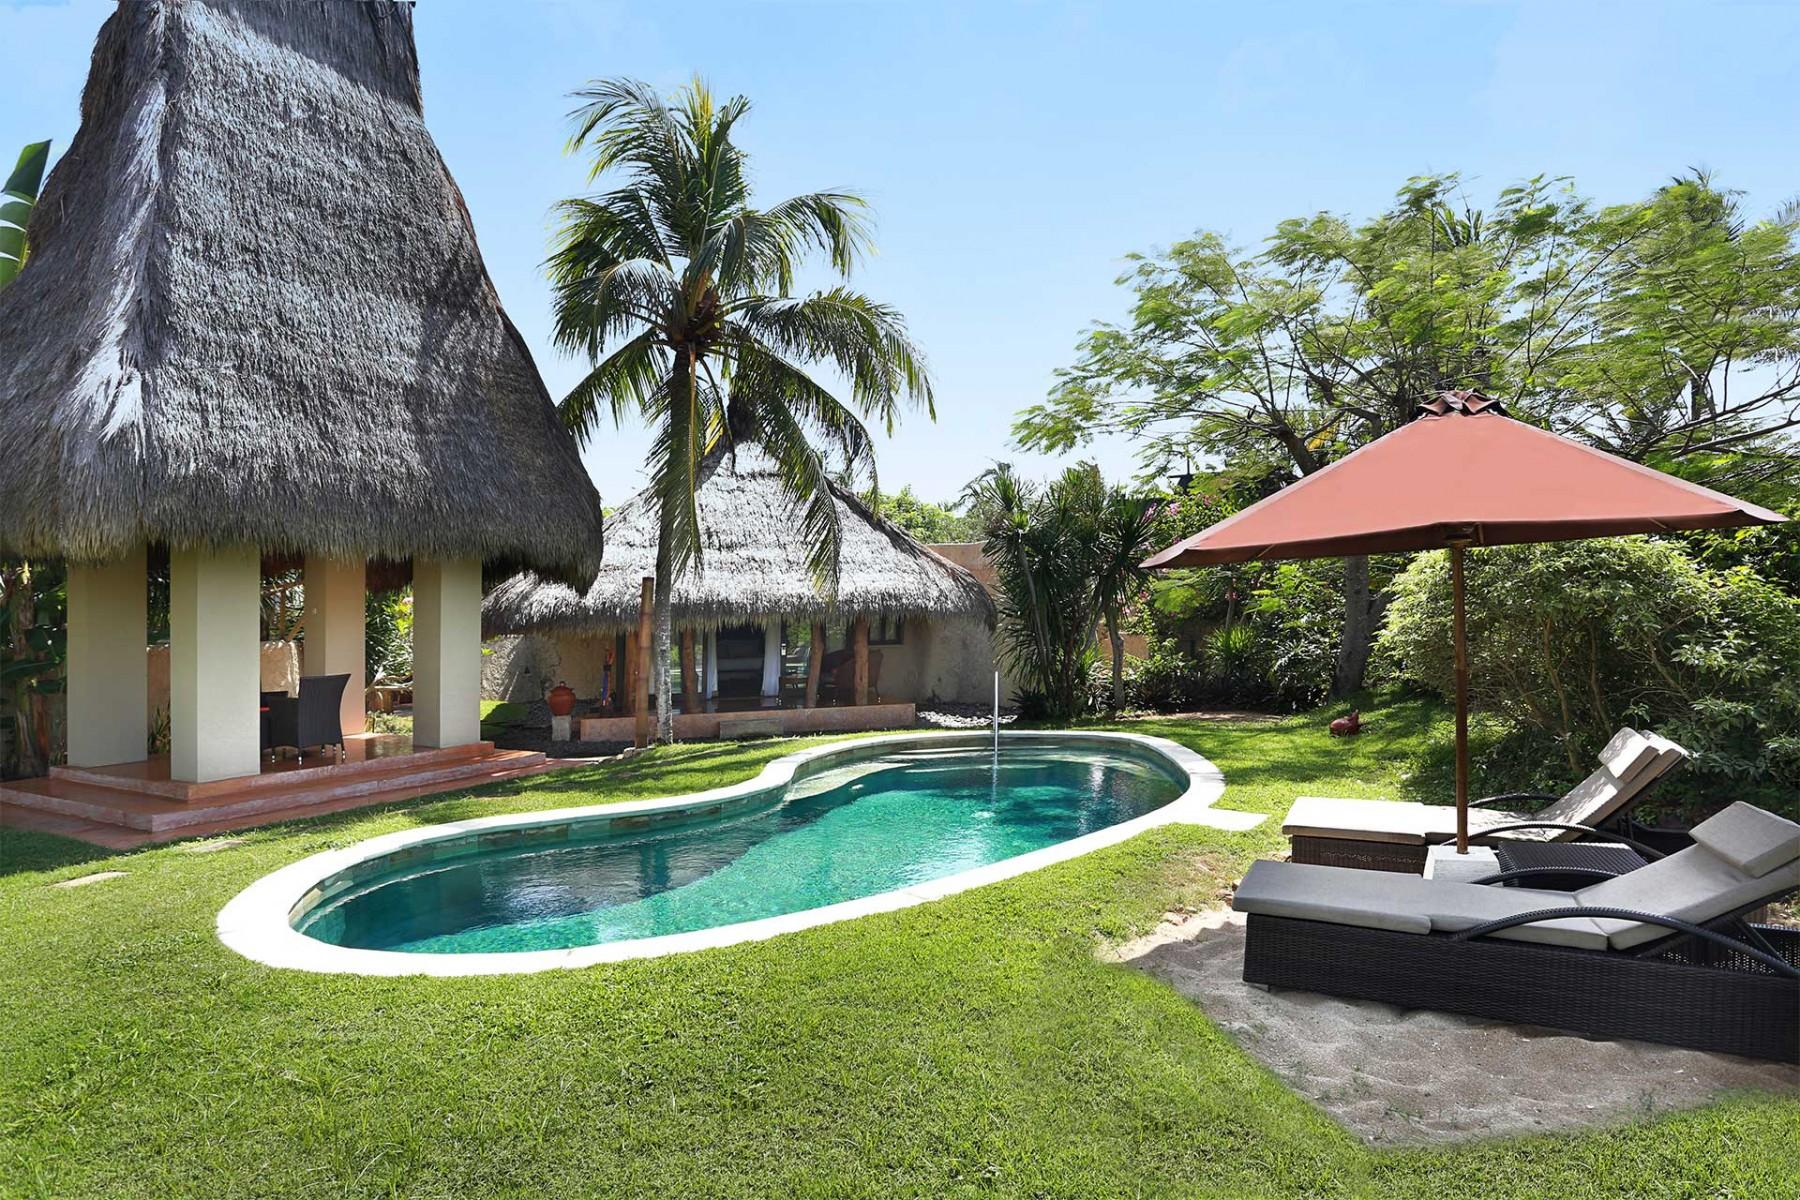 novotel lombok resort villas private pool villa rh novotellombok com hotel lombok dengan private pool best hotel in lombok with private pool